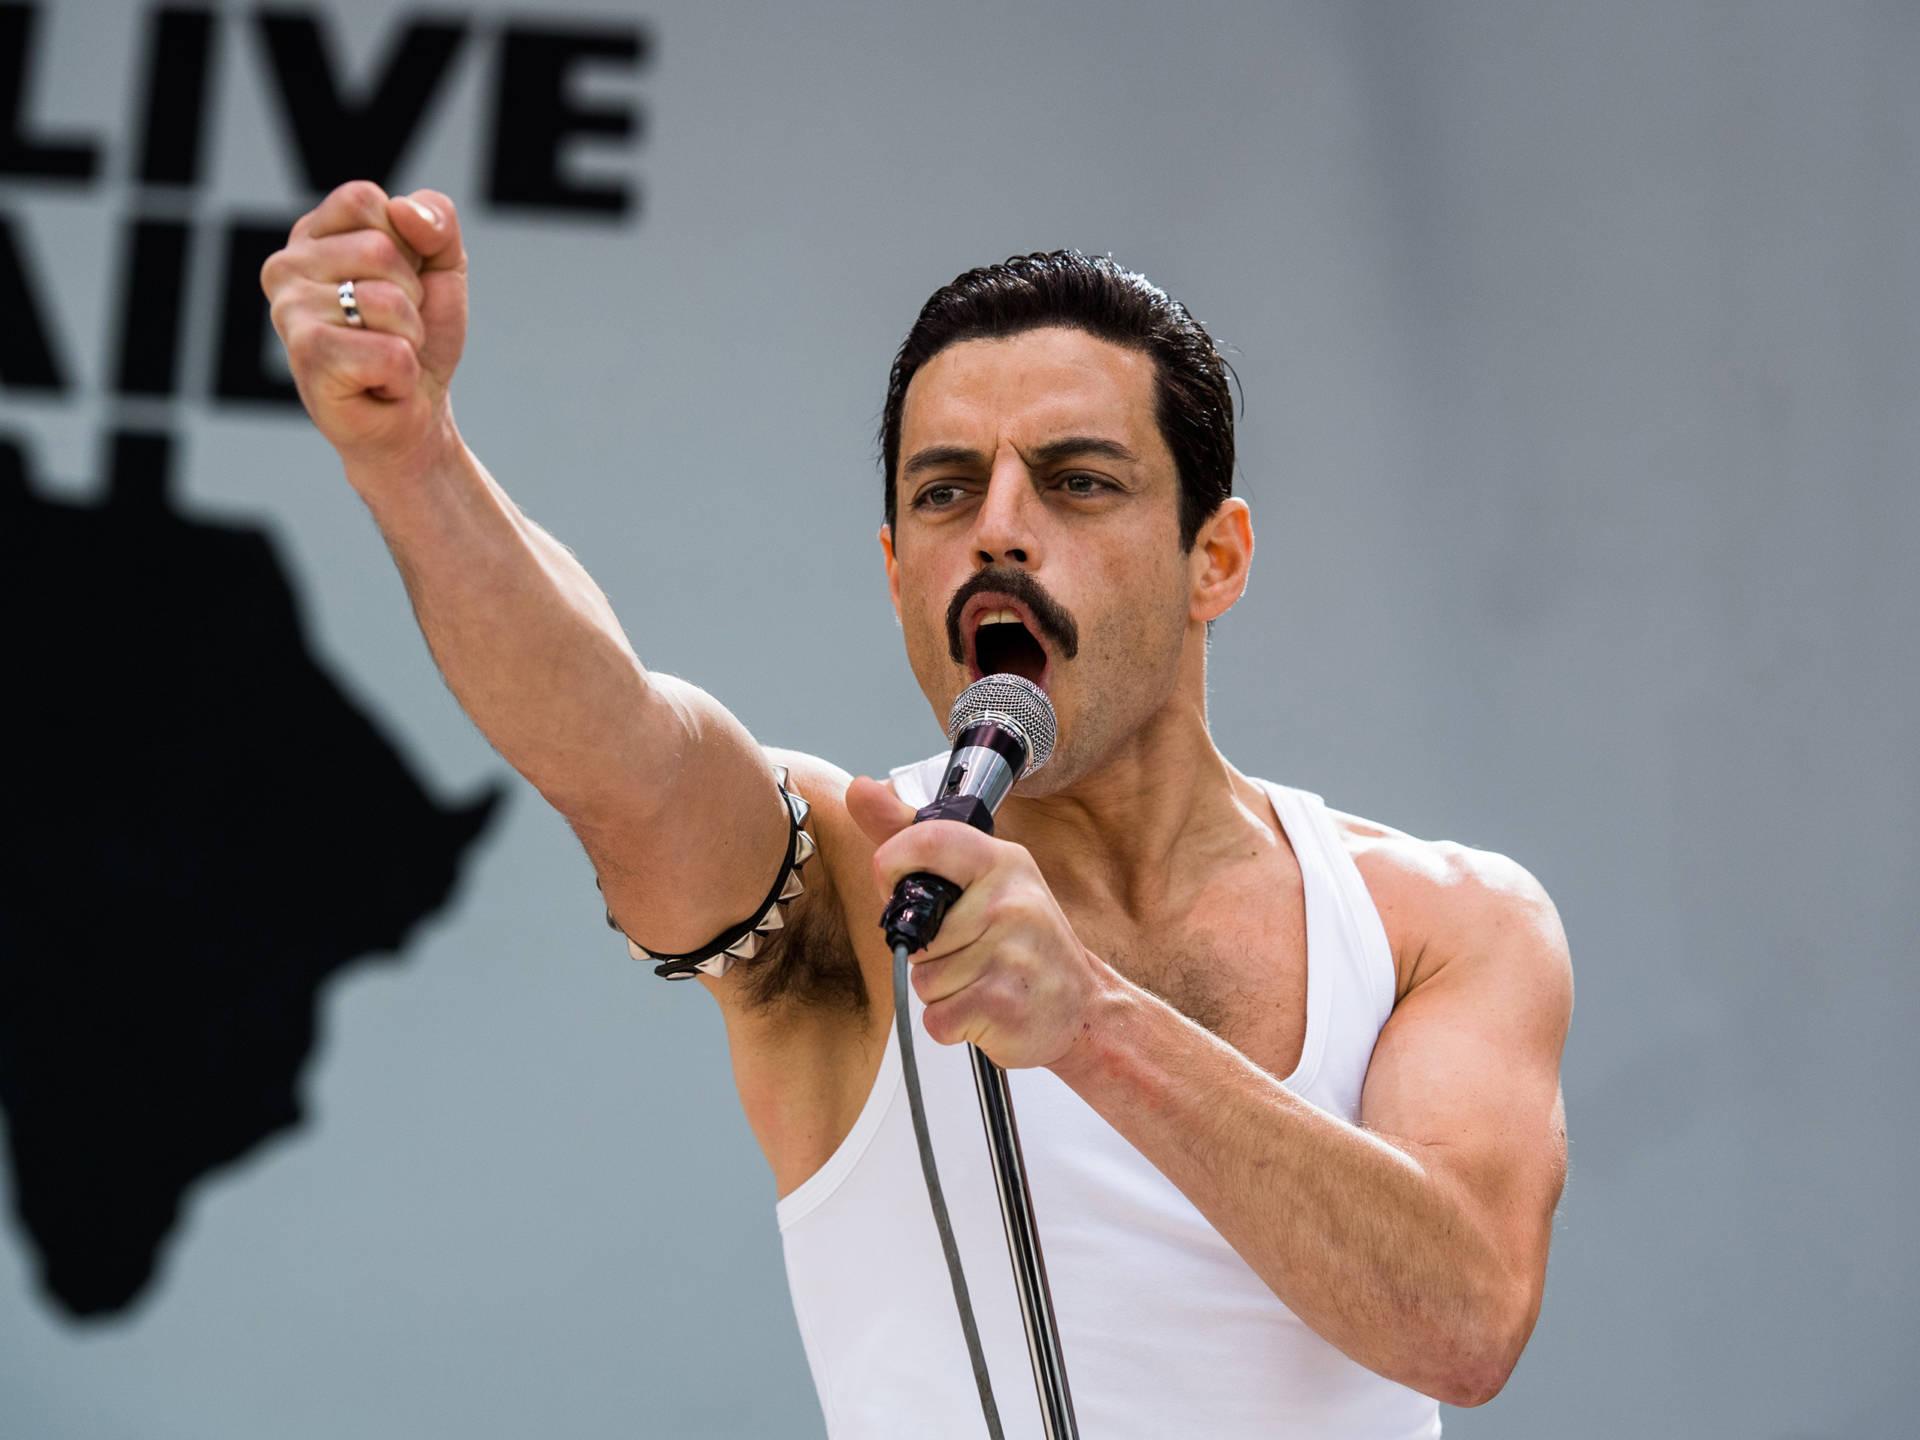 Rami Malek stars as Queen lead singer Freddie Mercury in 'Bohemian Rhapsody.' Alex Bailey/20th Century Fox